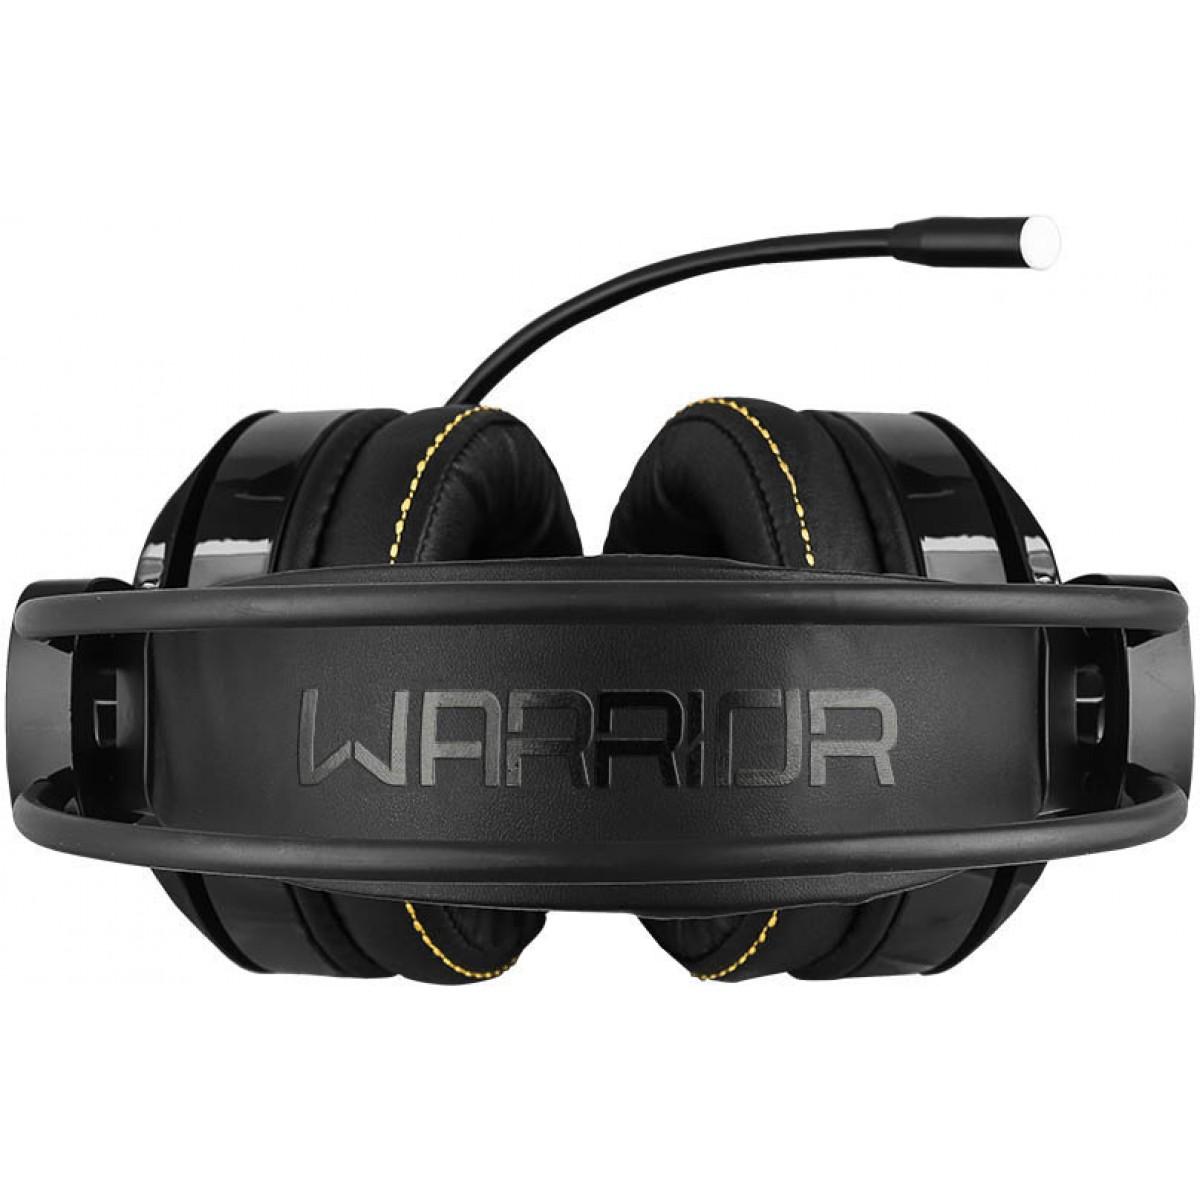 Headset Gamer Warrior Thyra Rgb, 7.1 Surround Com Vibracao, Black, PH290